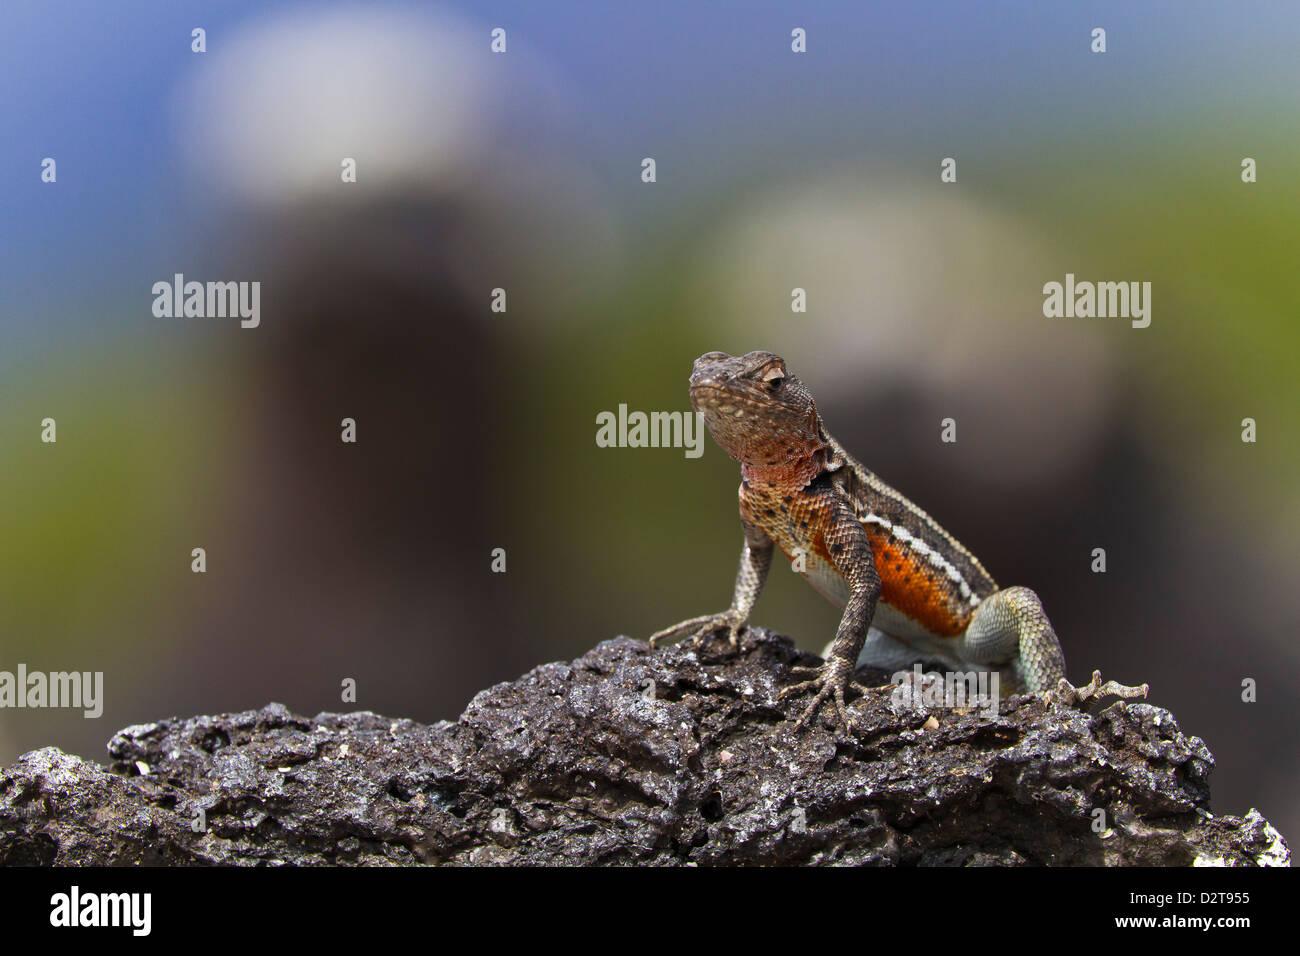 Lava lizard (Microlophus spp), Las Bachas, Santa Cruz Island, Galapagos Islands, Ecuador, South America - Stock Image